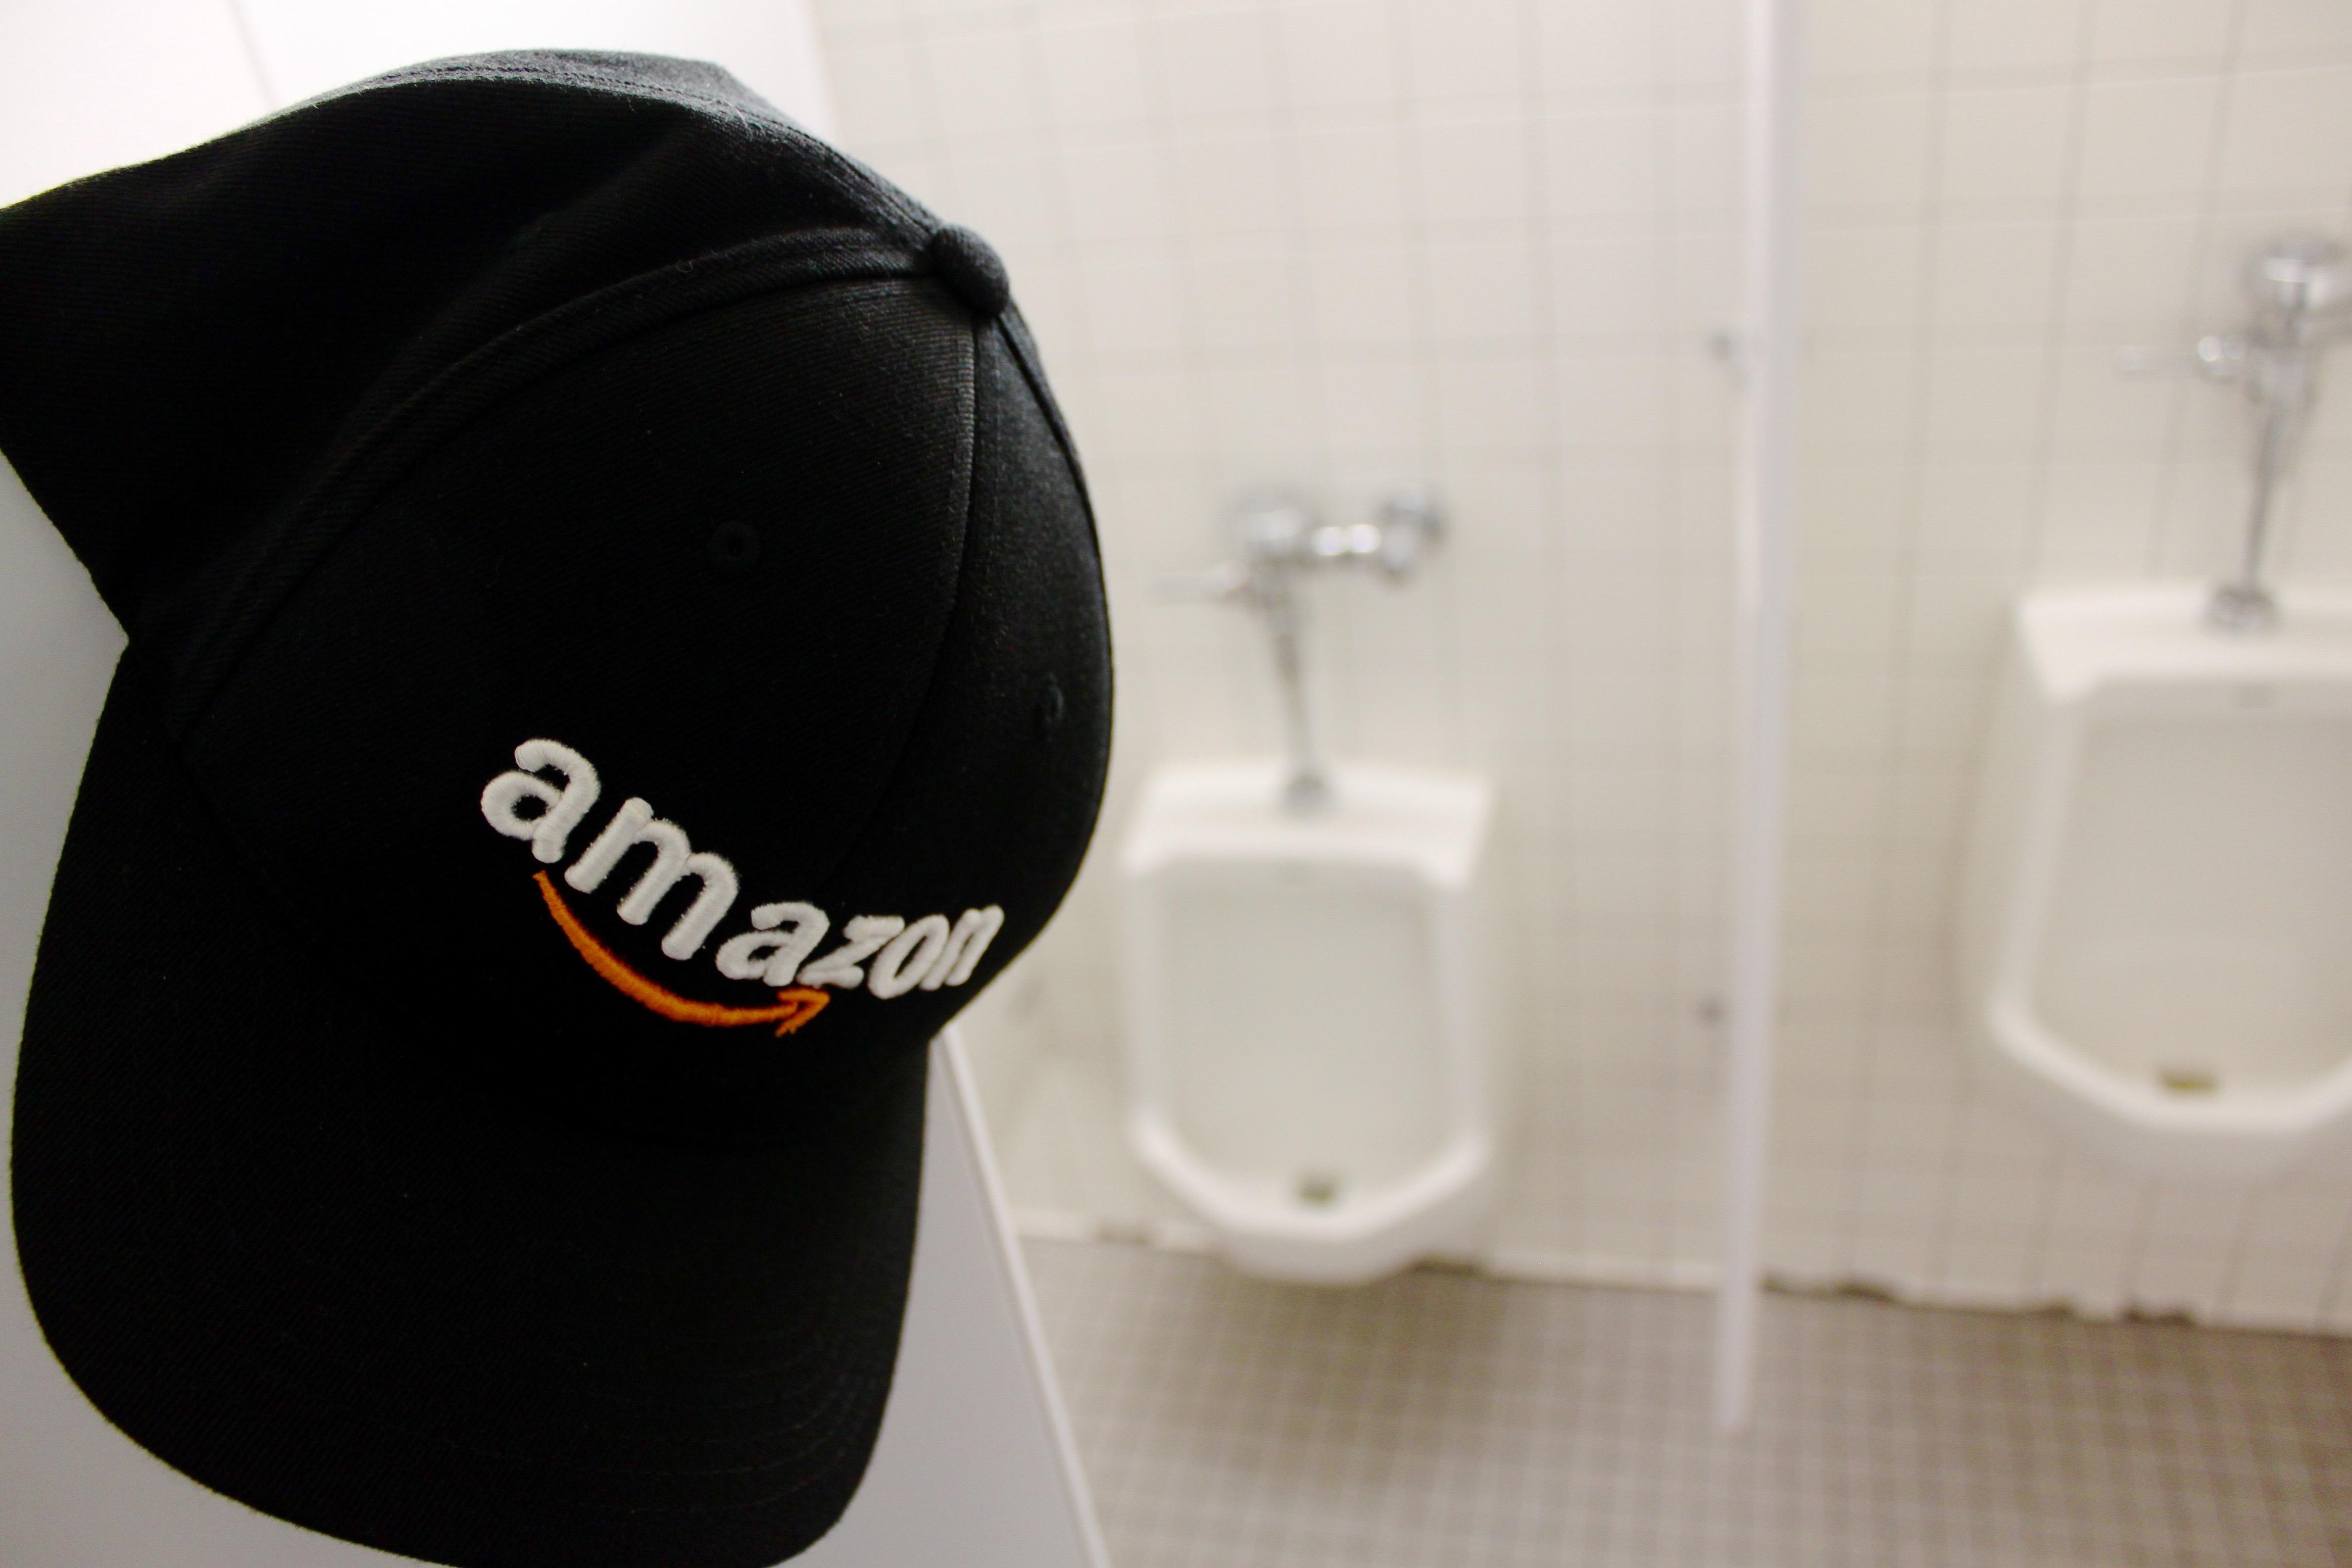 amazon u0026 39 s potty problem  too many dudes  not enough toilets